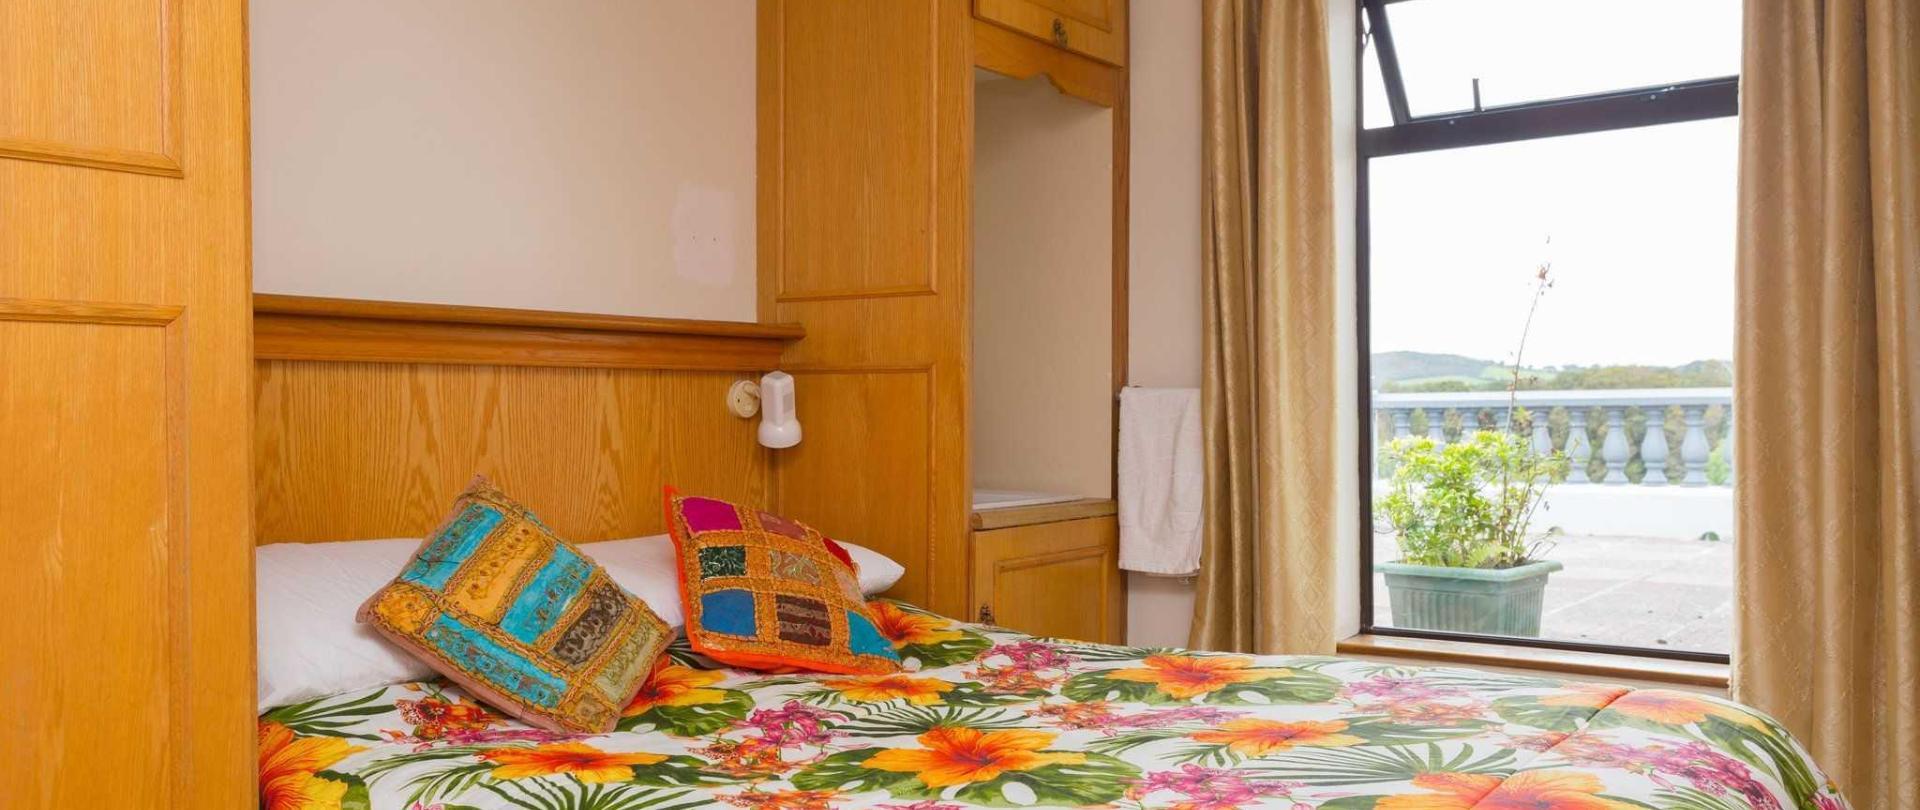 double-room-2.jpg